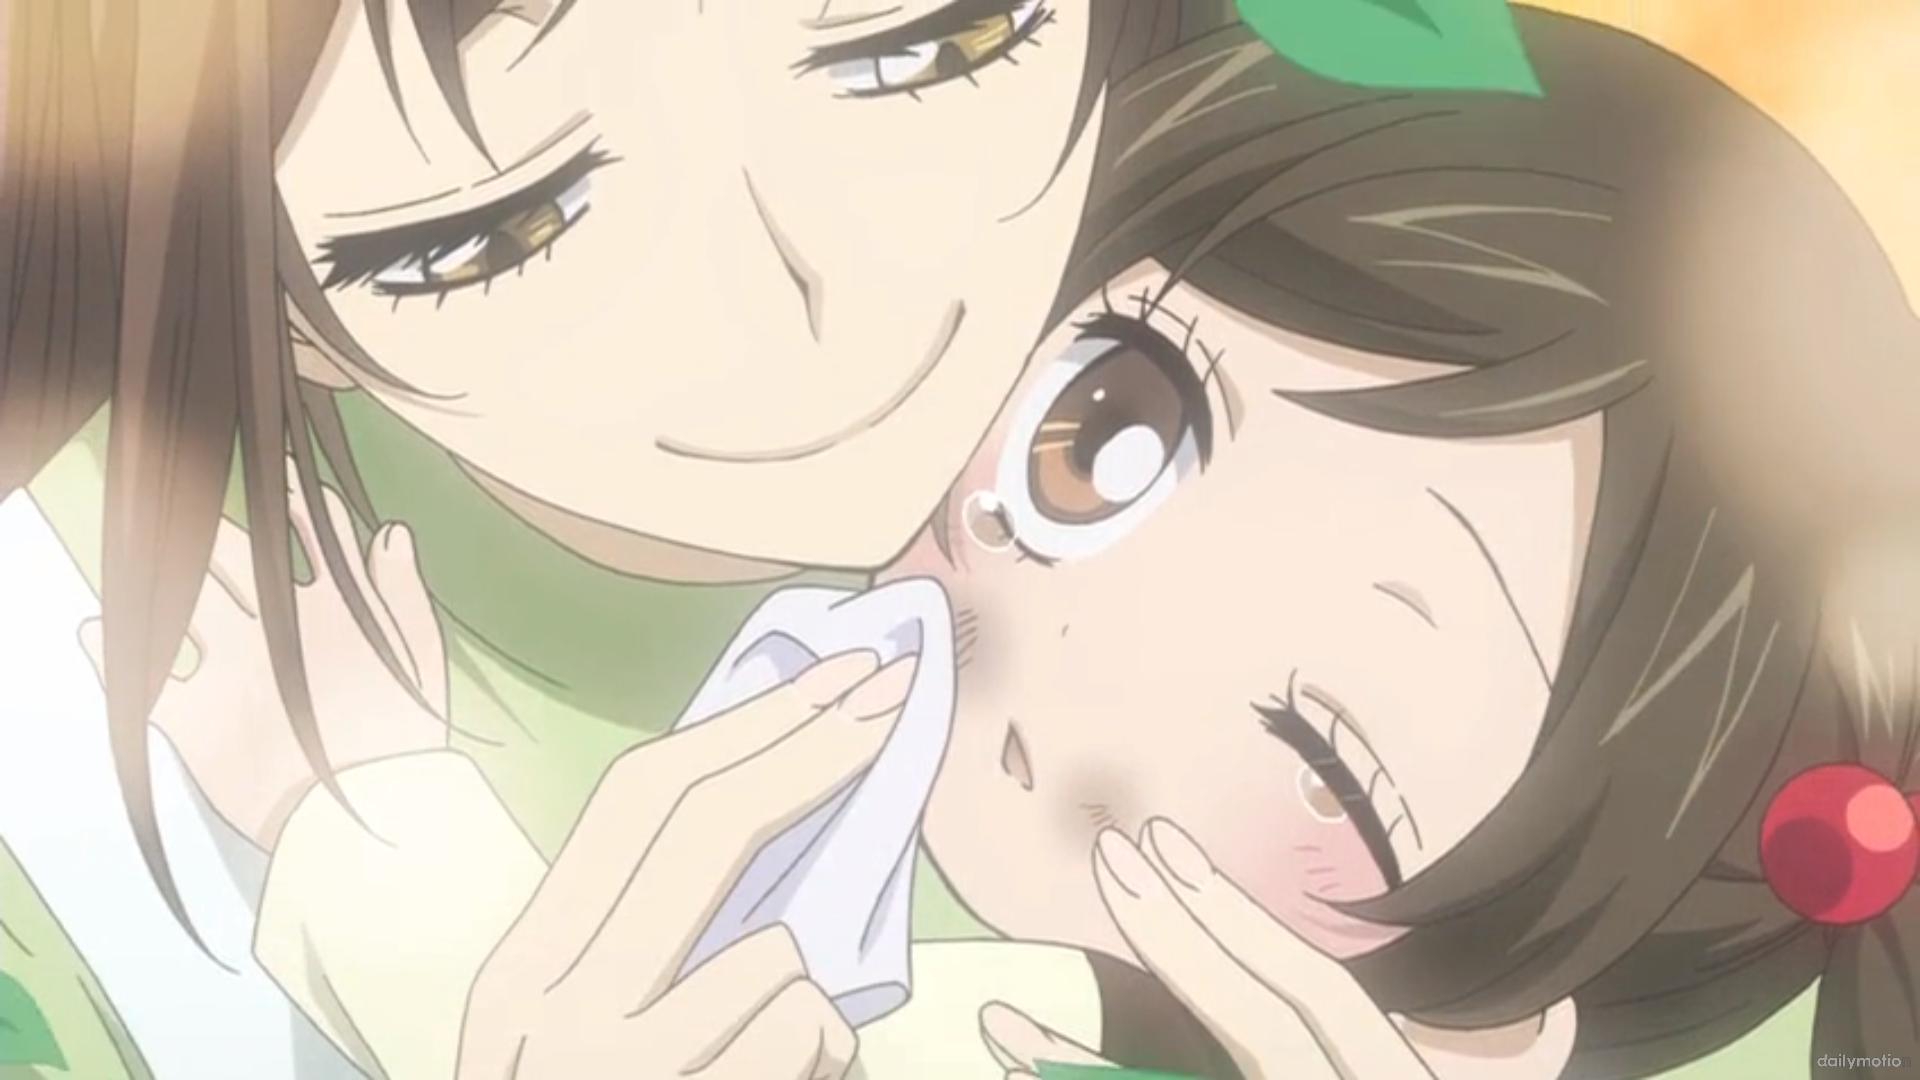 Gay male anime porn